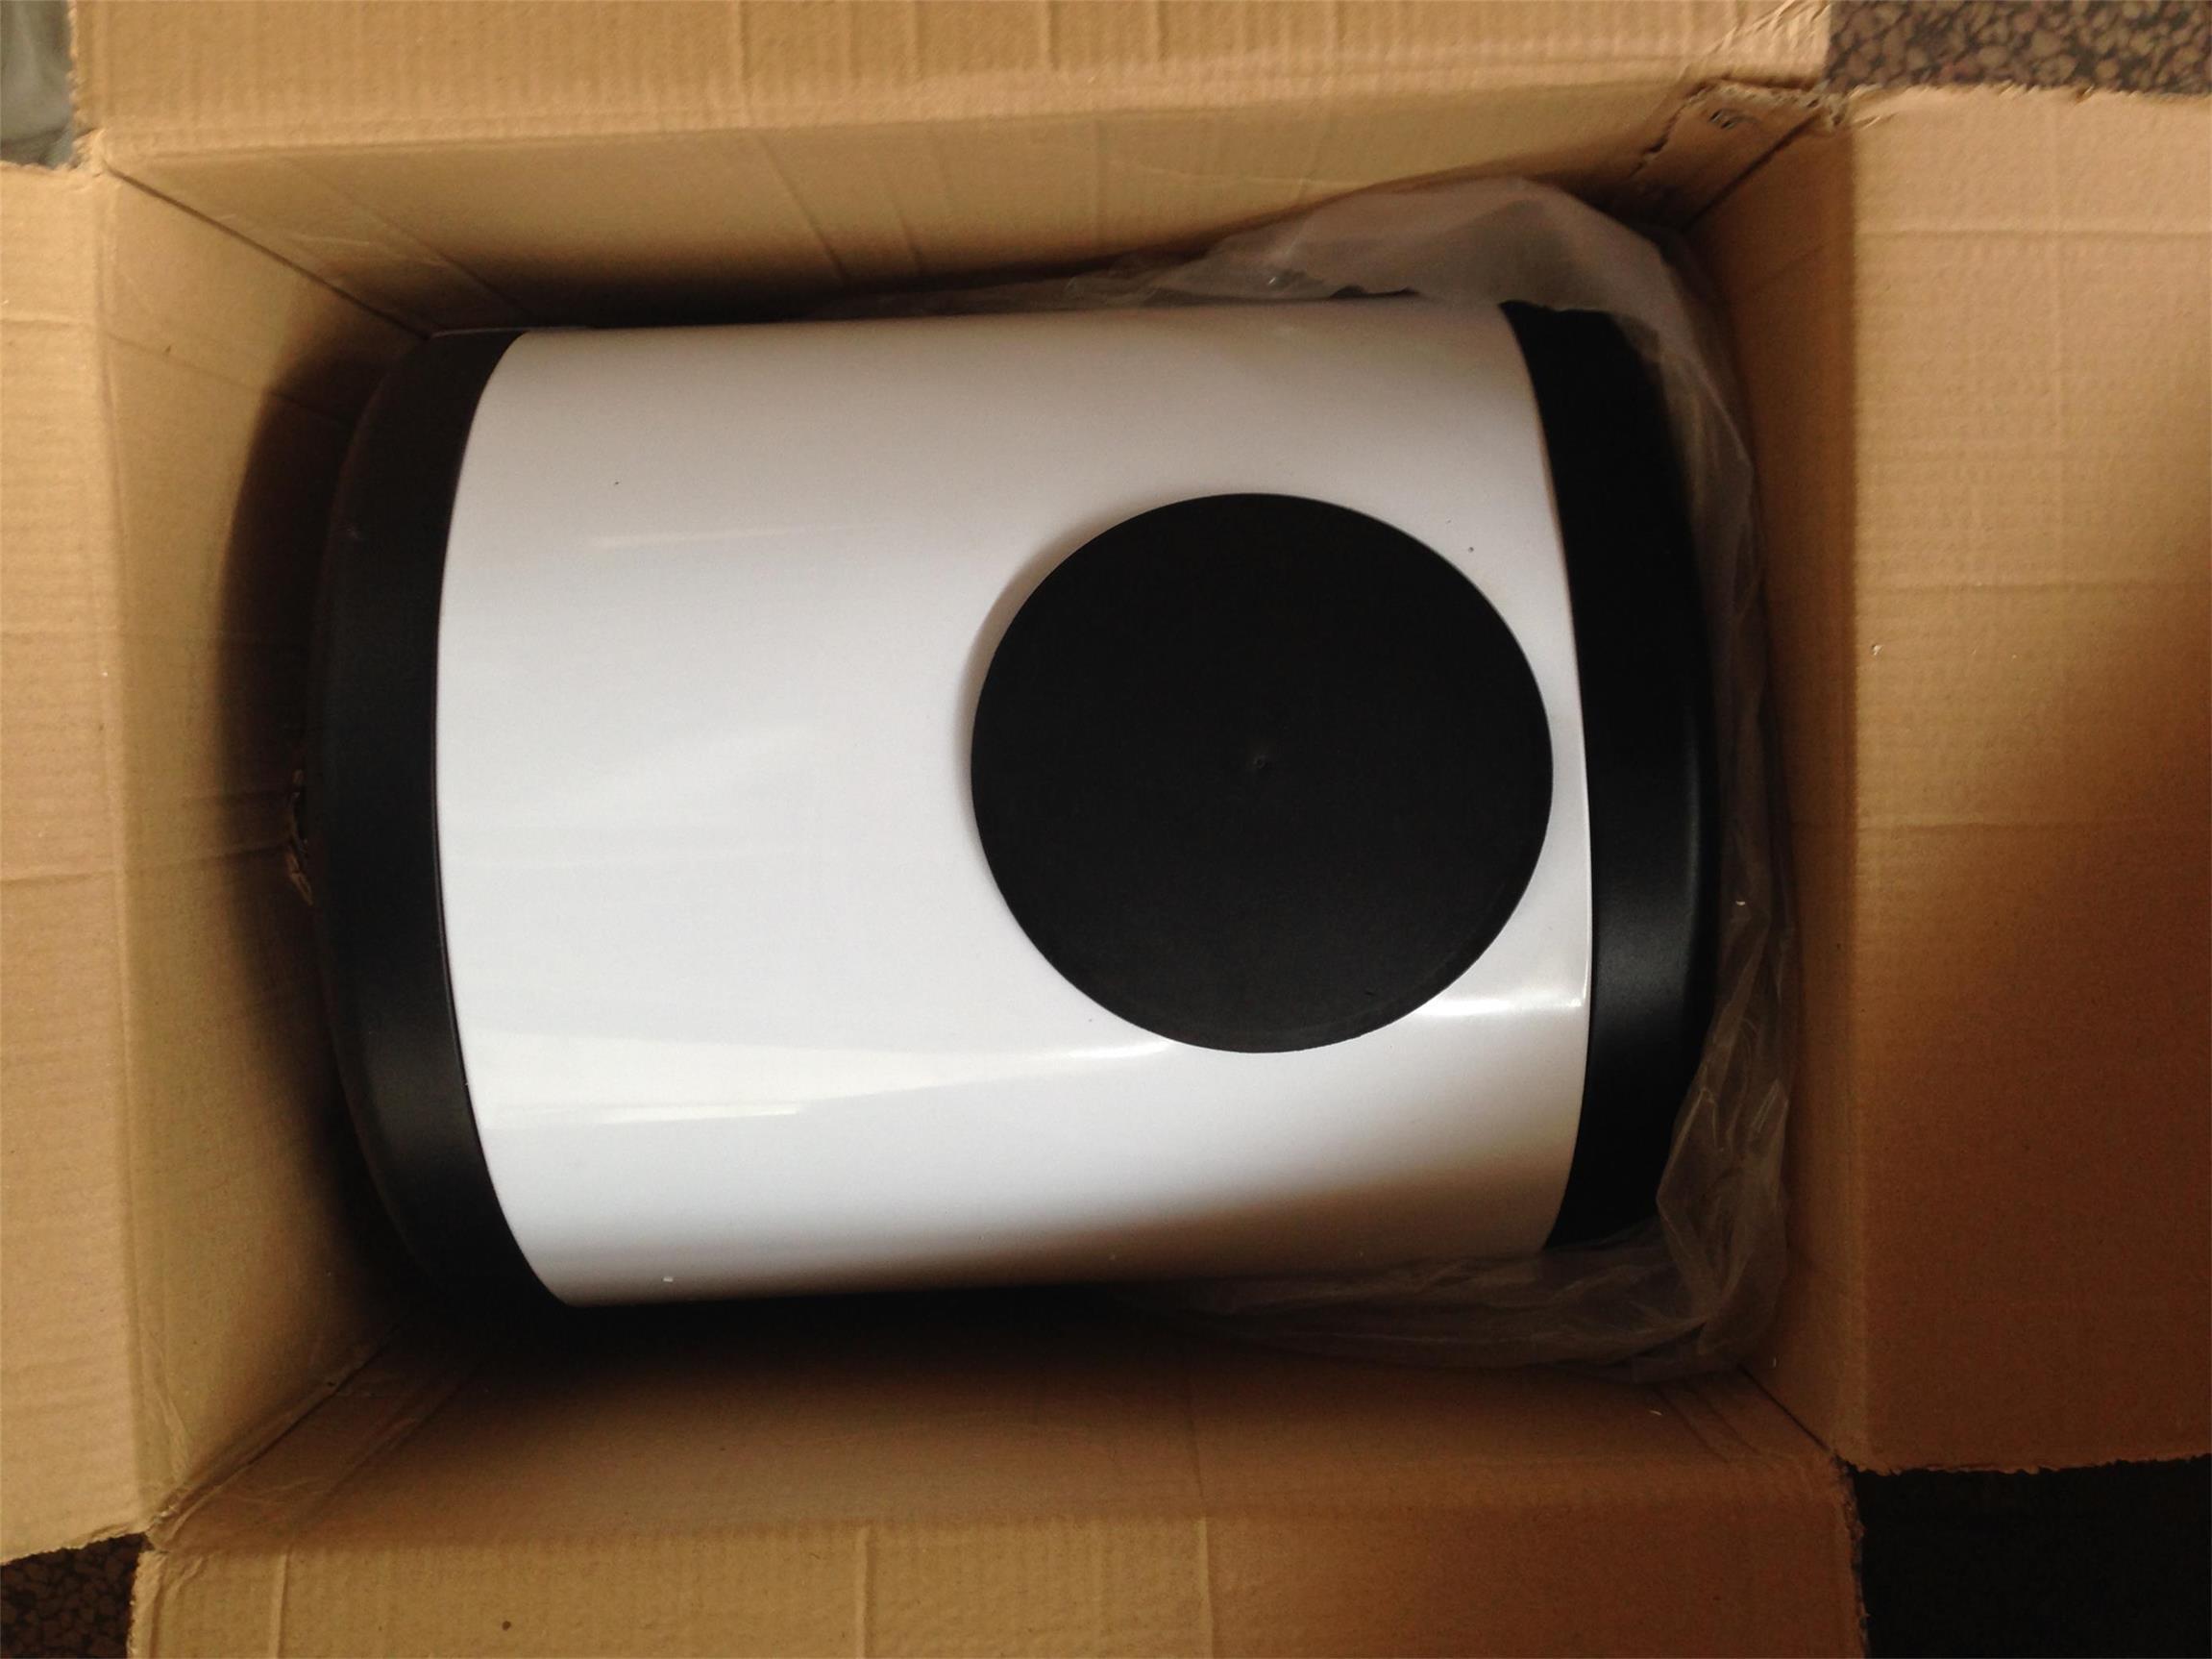 Solar Hot Water Heater Filling Tank